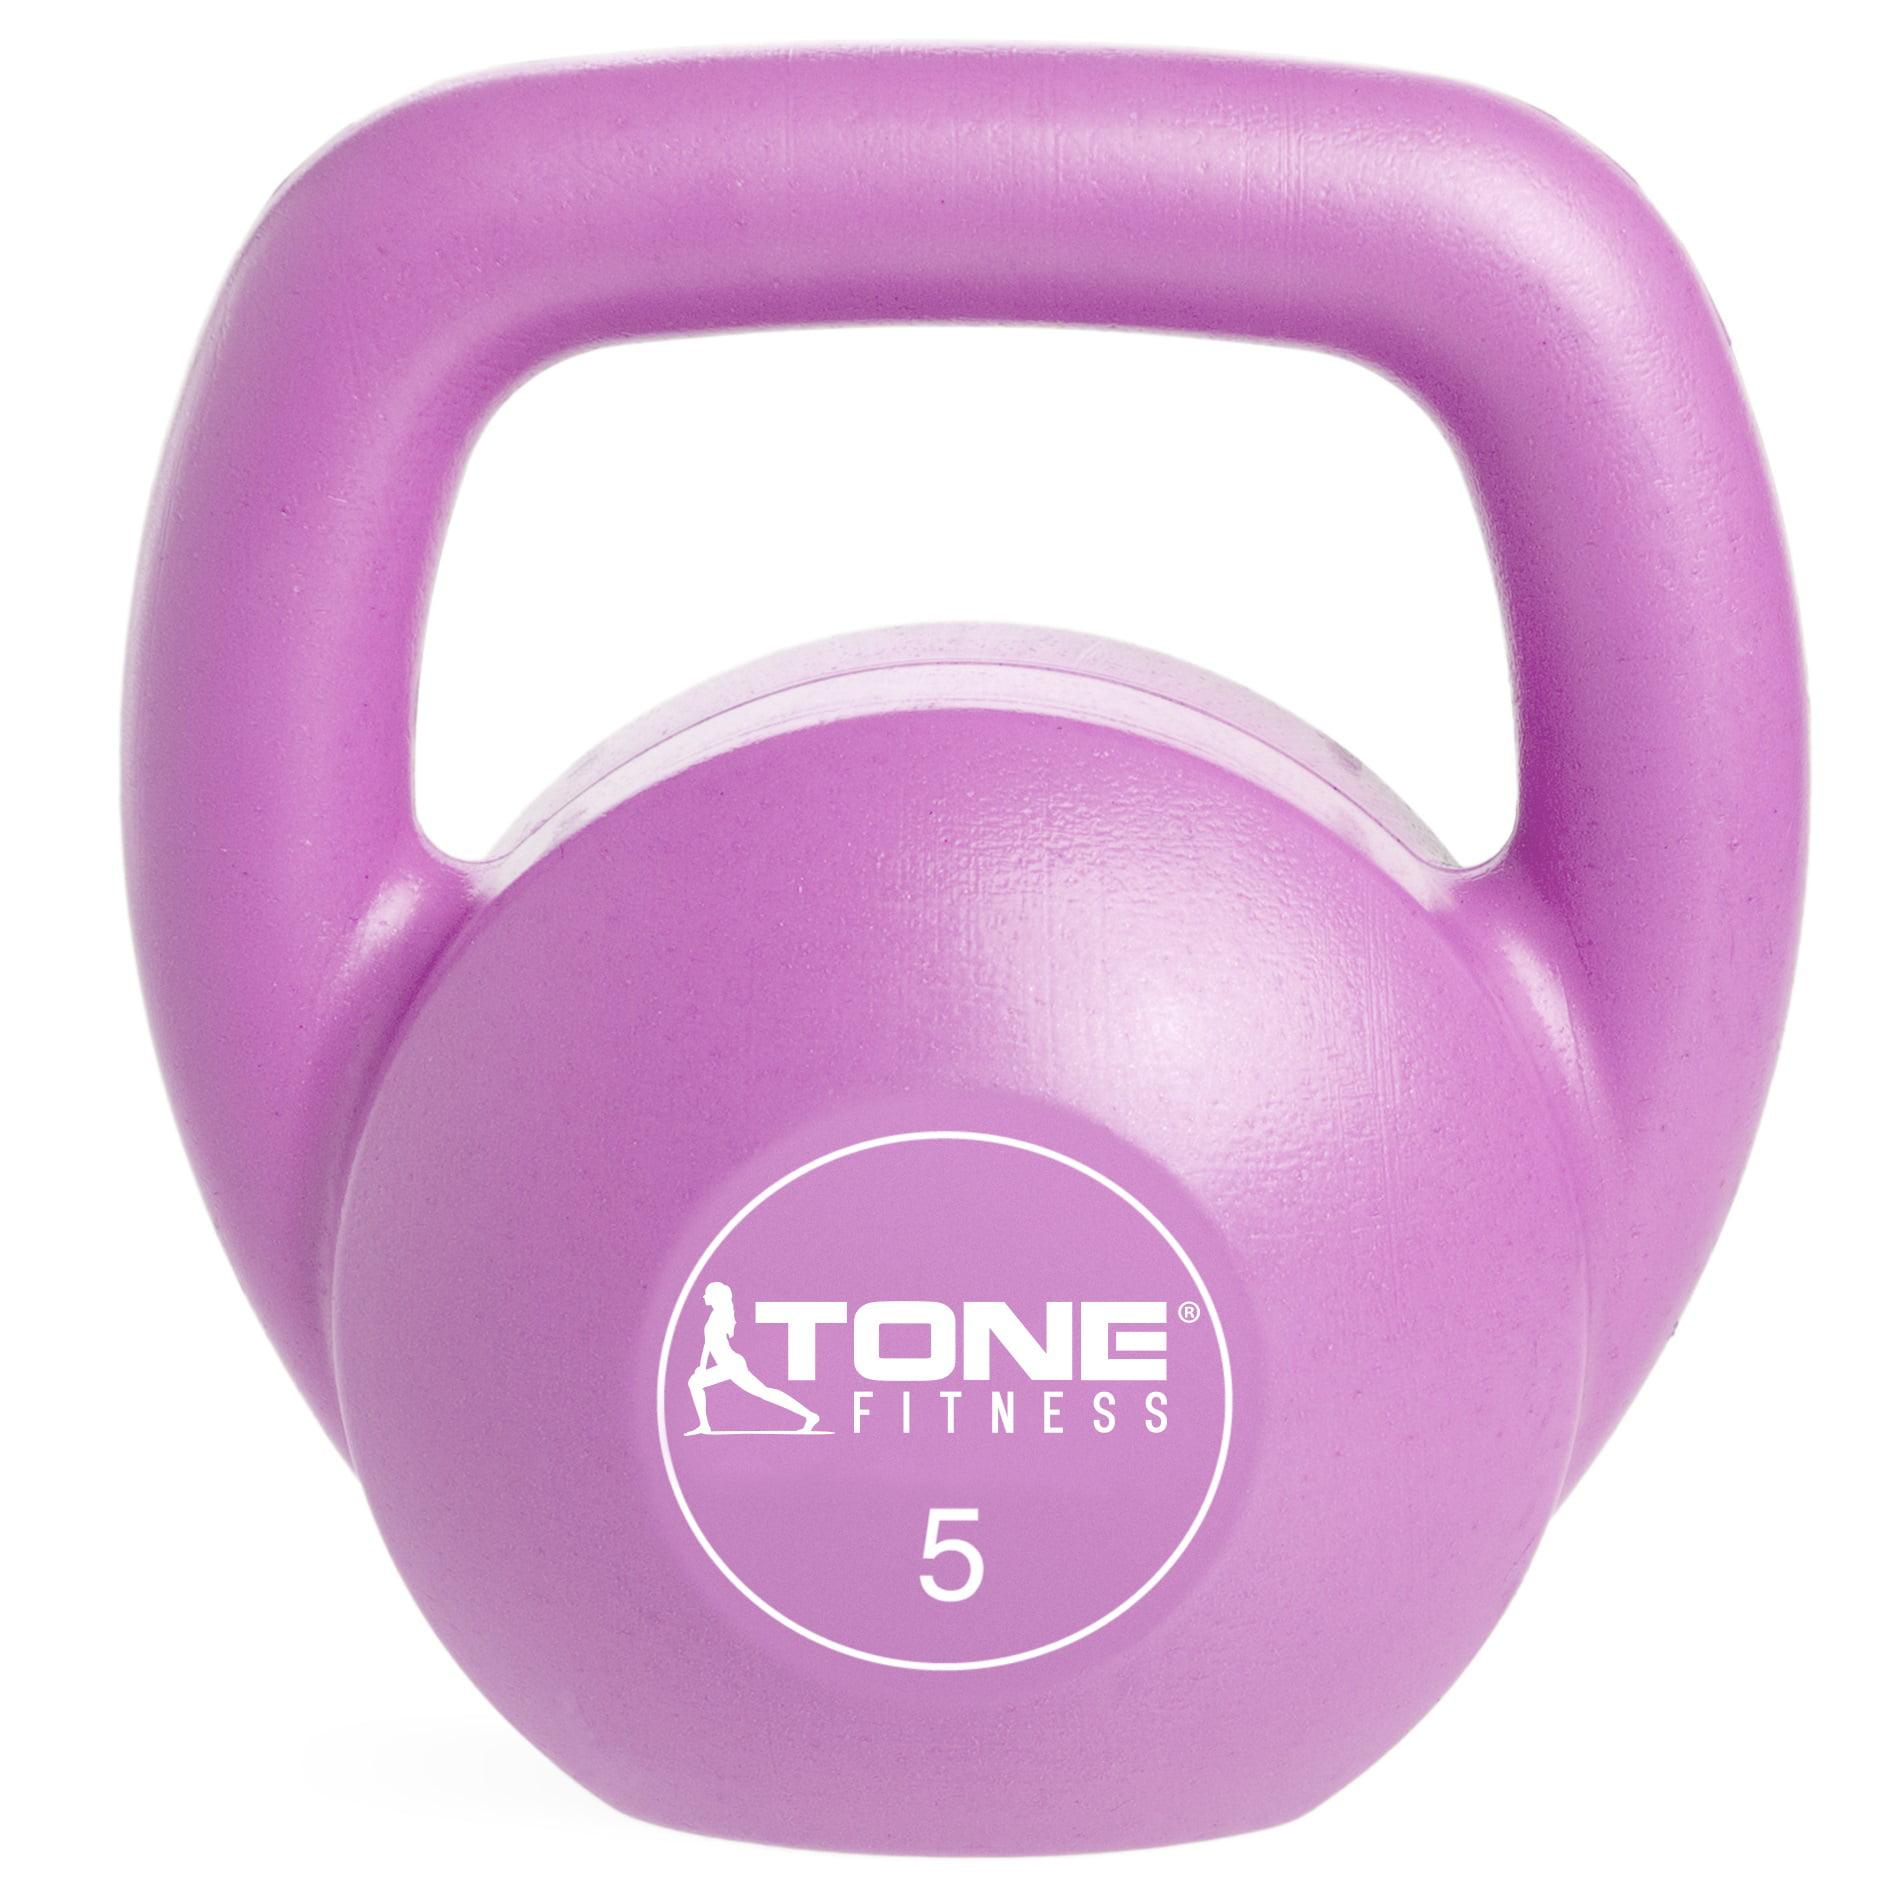 Tone Fitness Kettlebells 12lb Plastic NEW